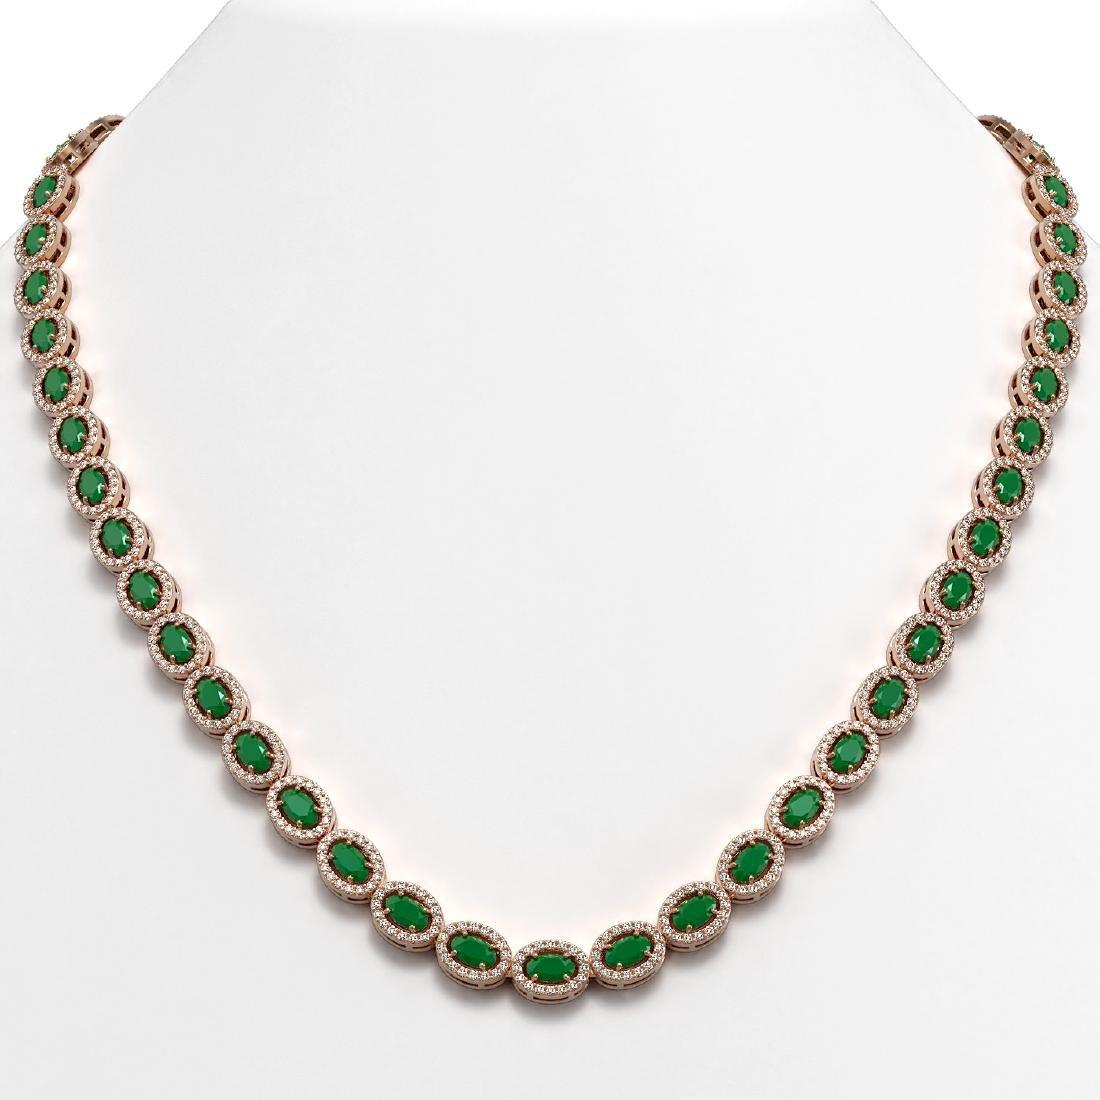 26.38 CTW Emerald & Diamond Halo Necklace 10K Rose Gold